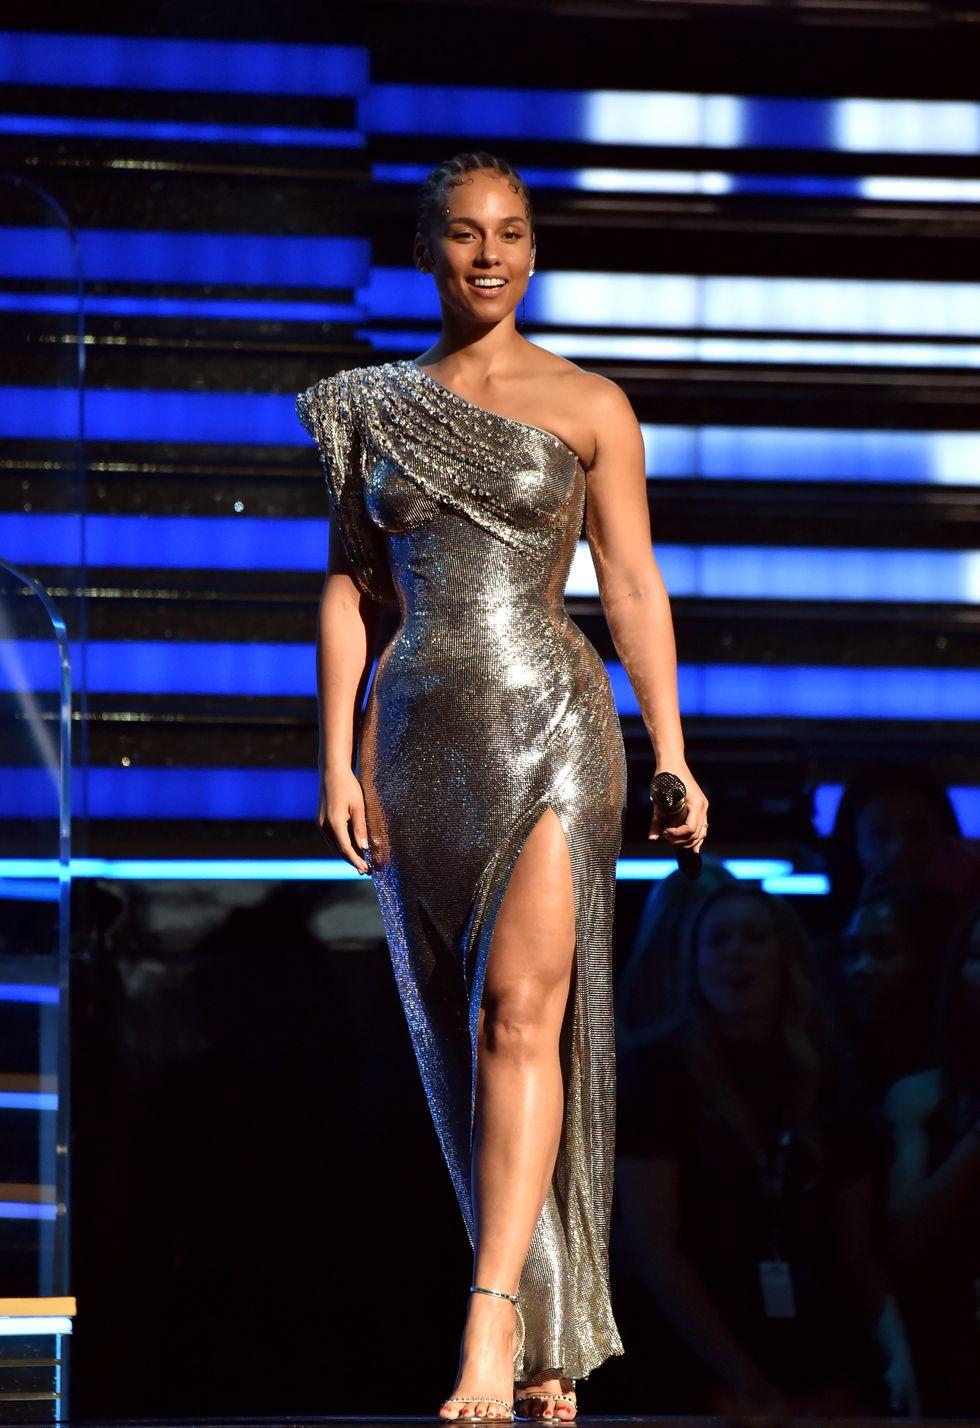 Alicia Keys - Atelier Versace